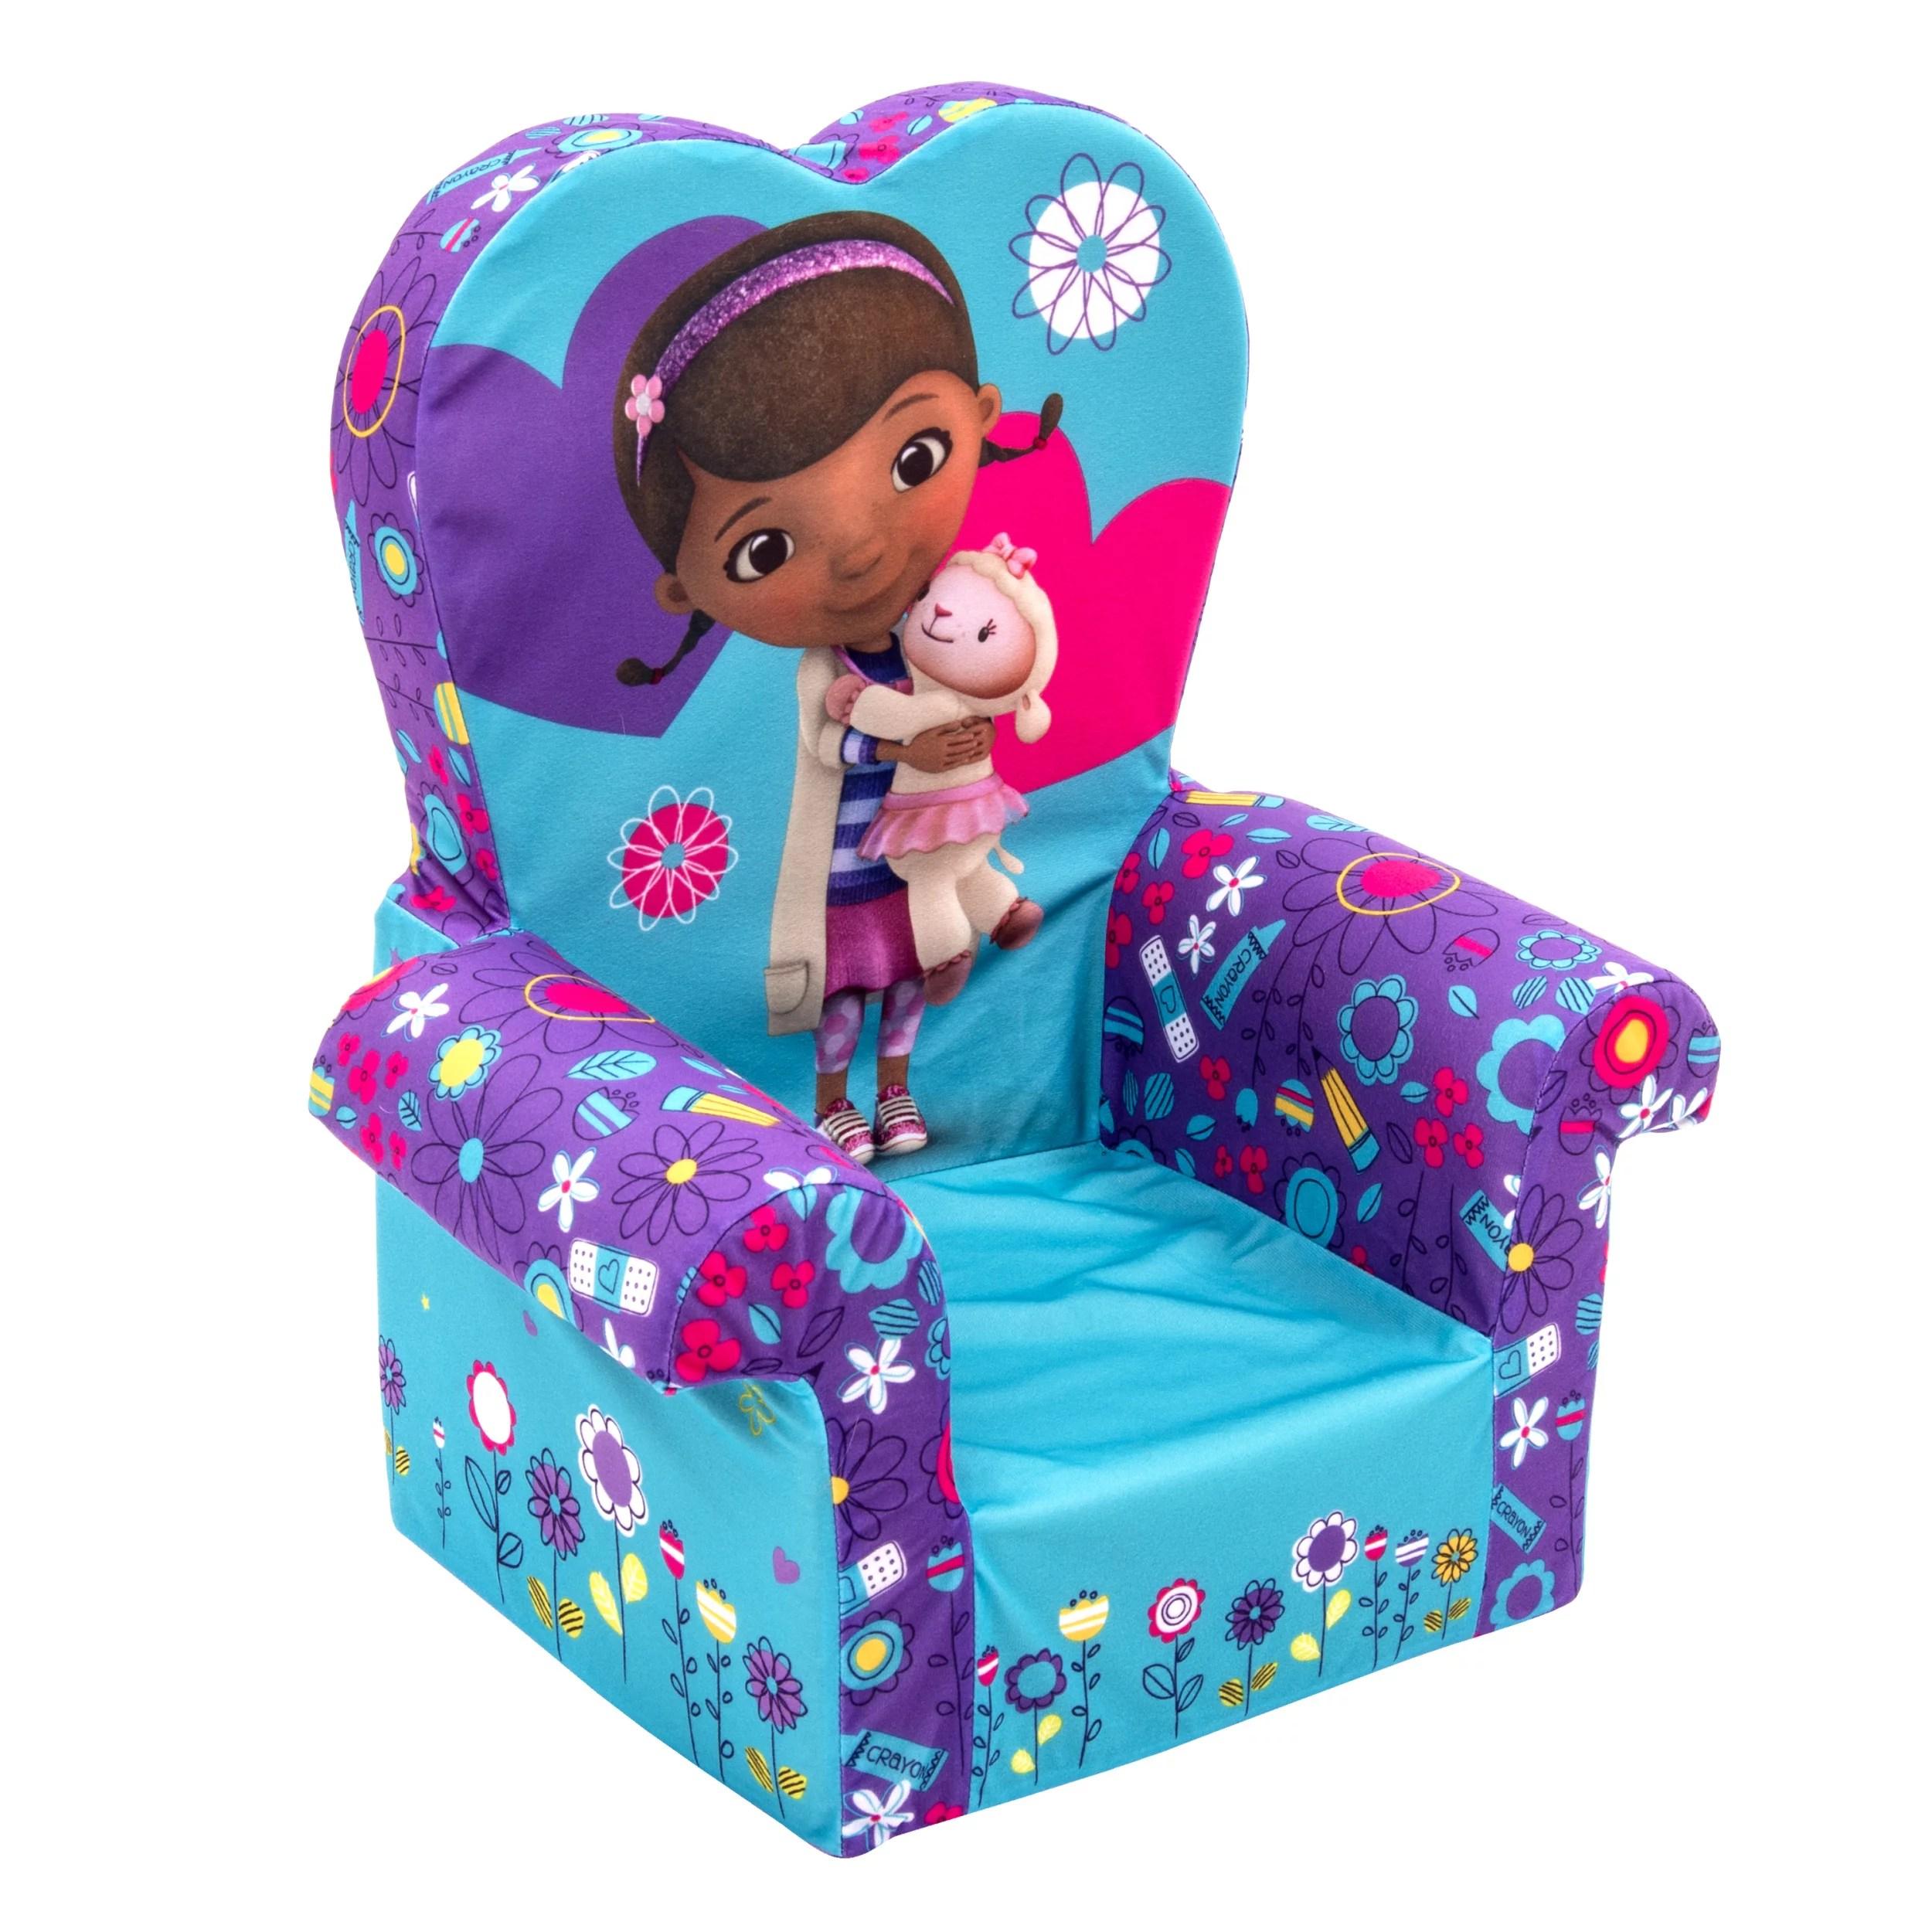 doc mcstuffin chair z covers uk marshmallow furniture children s foam high back mcstuffins walmart com